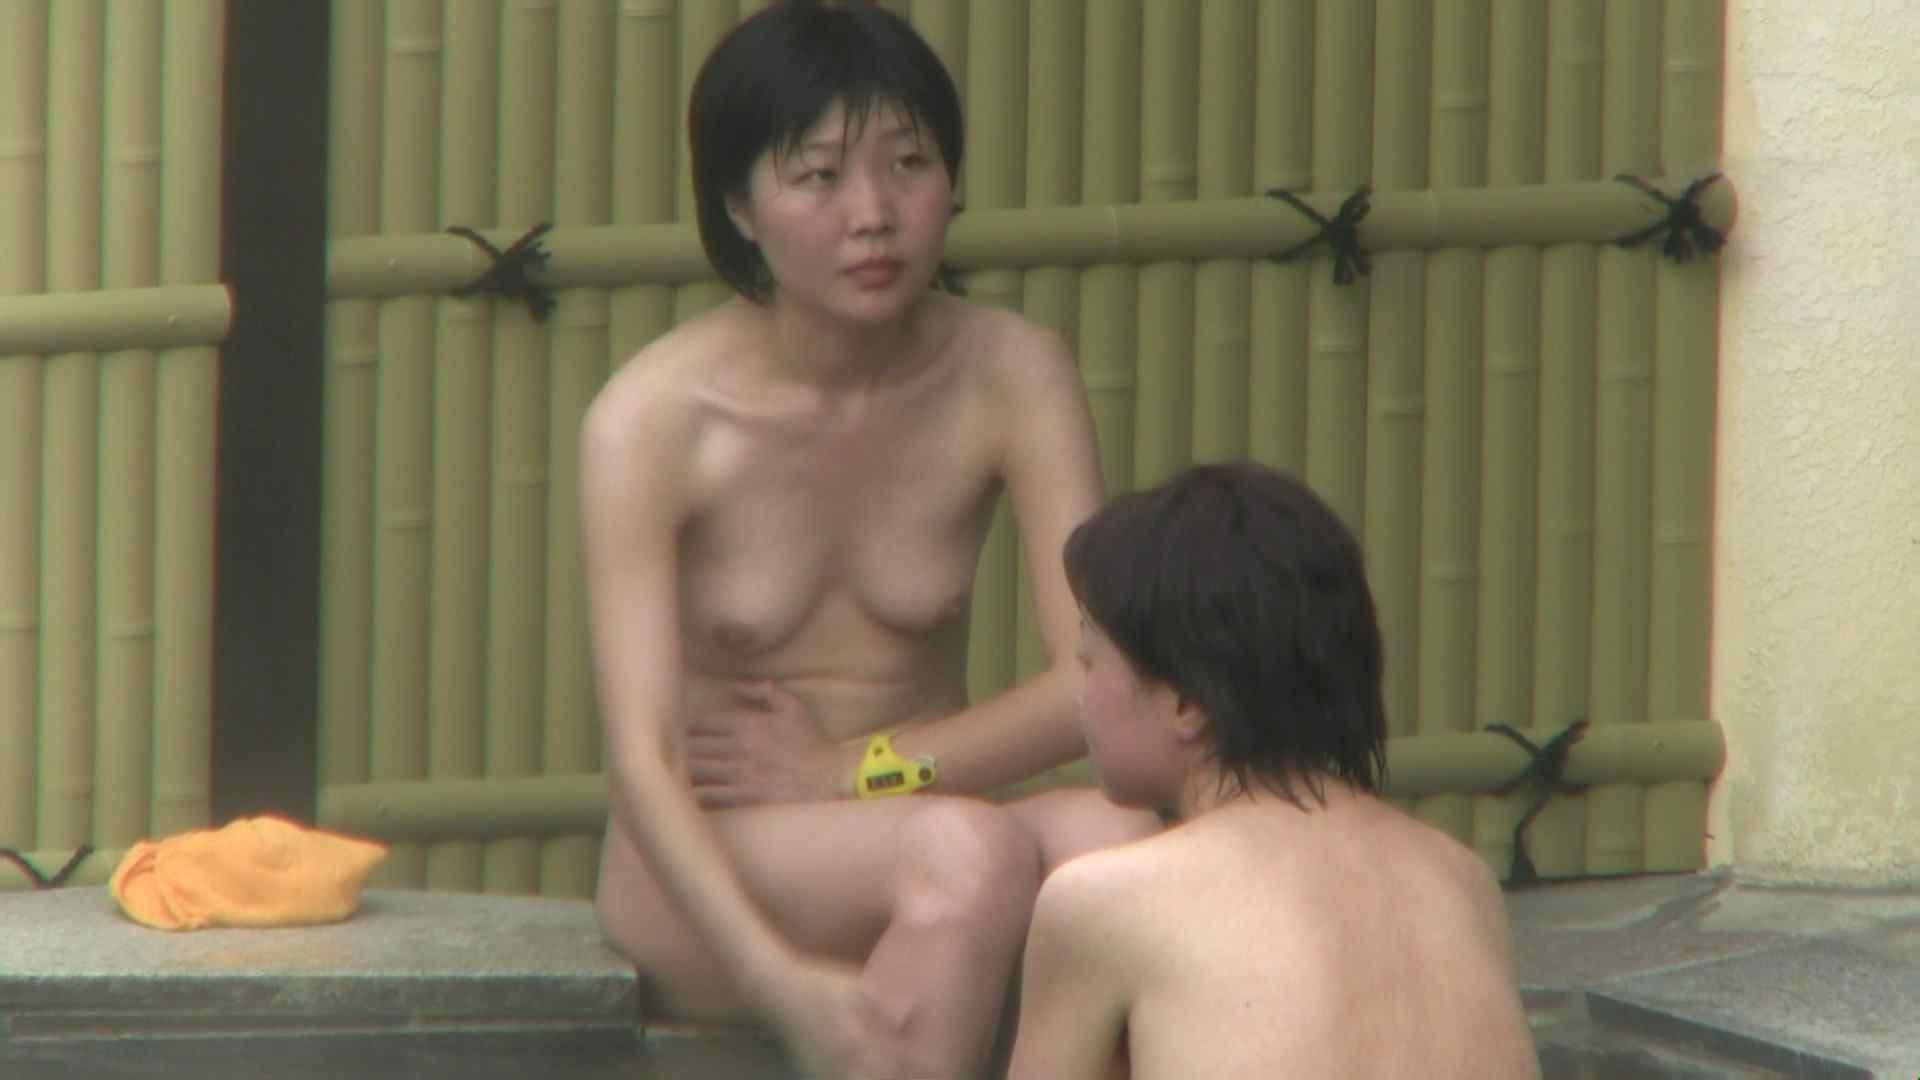 Aquaな露天風呂Vol.74【VIP限定】 OLセックス | 露天  68画像 67